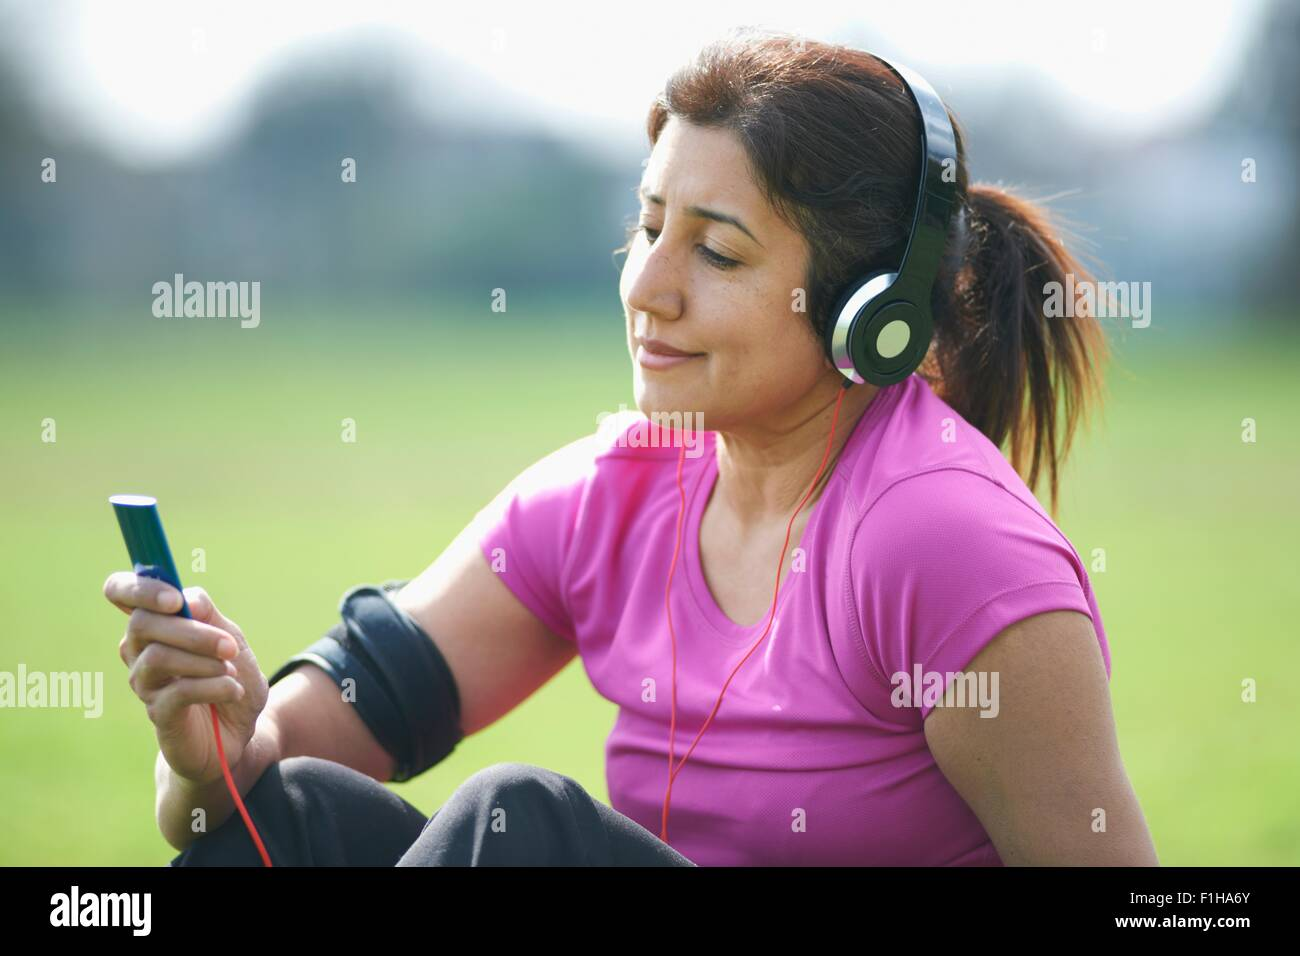 Reife Frau Übung Pause im Park Auswahl Musik vom MP3-player Stockbild